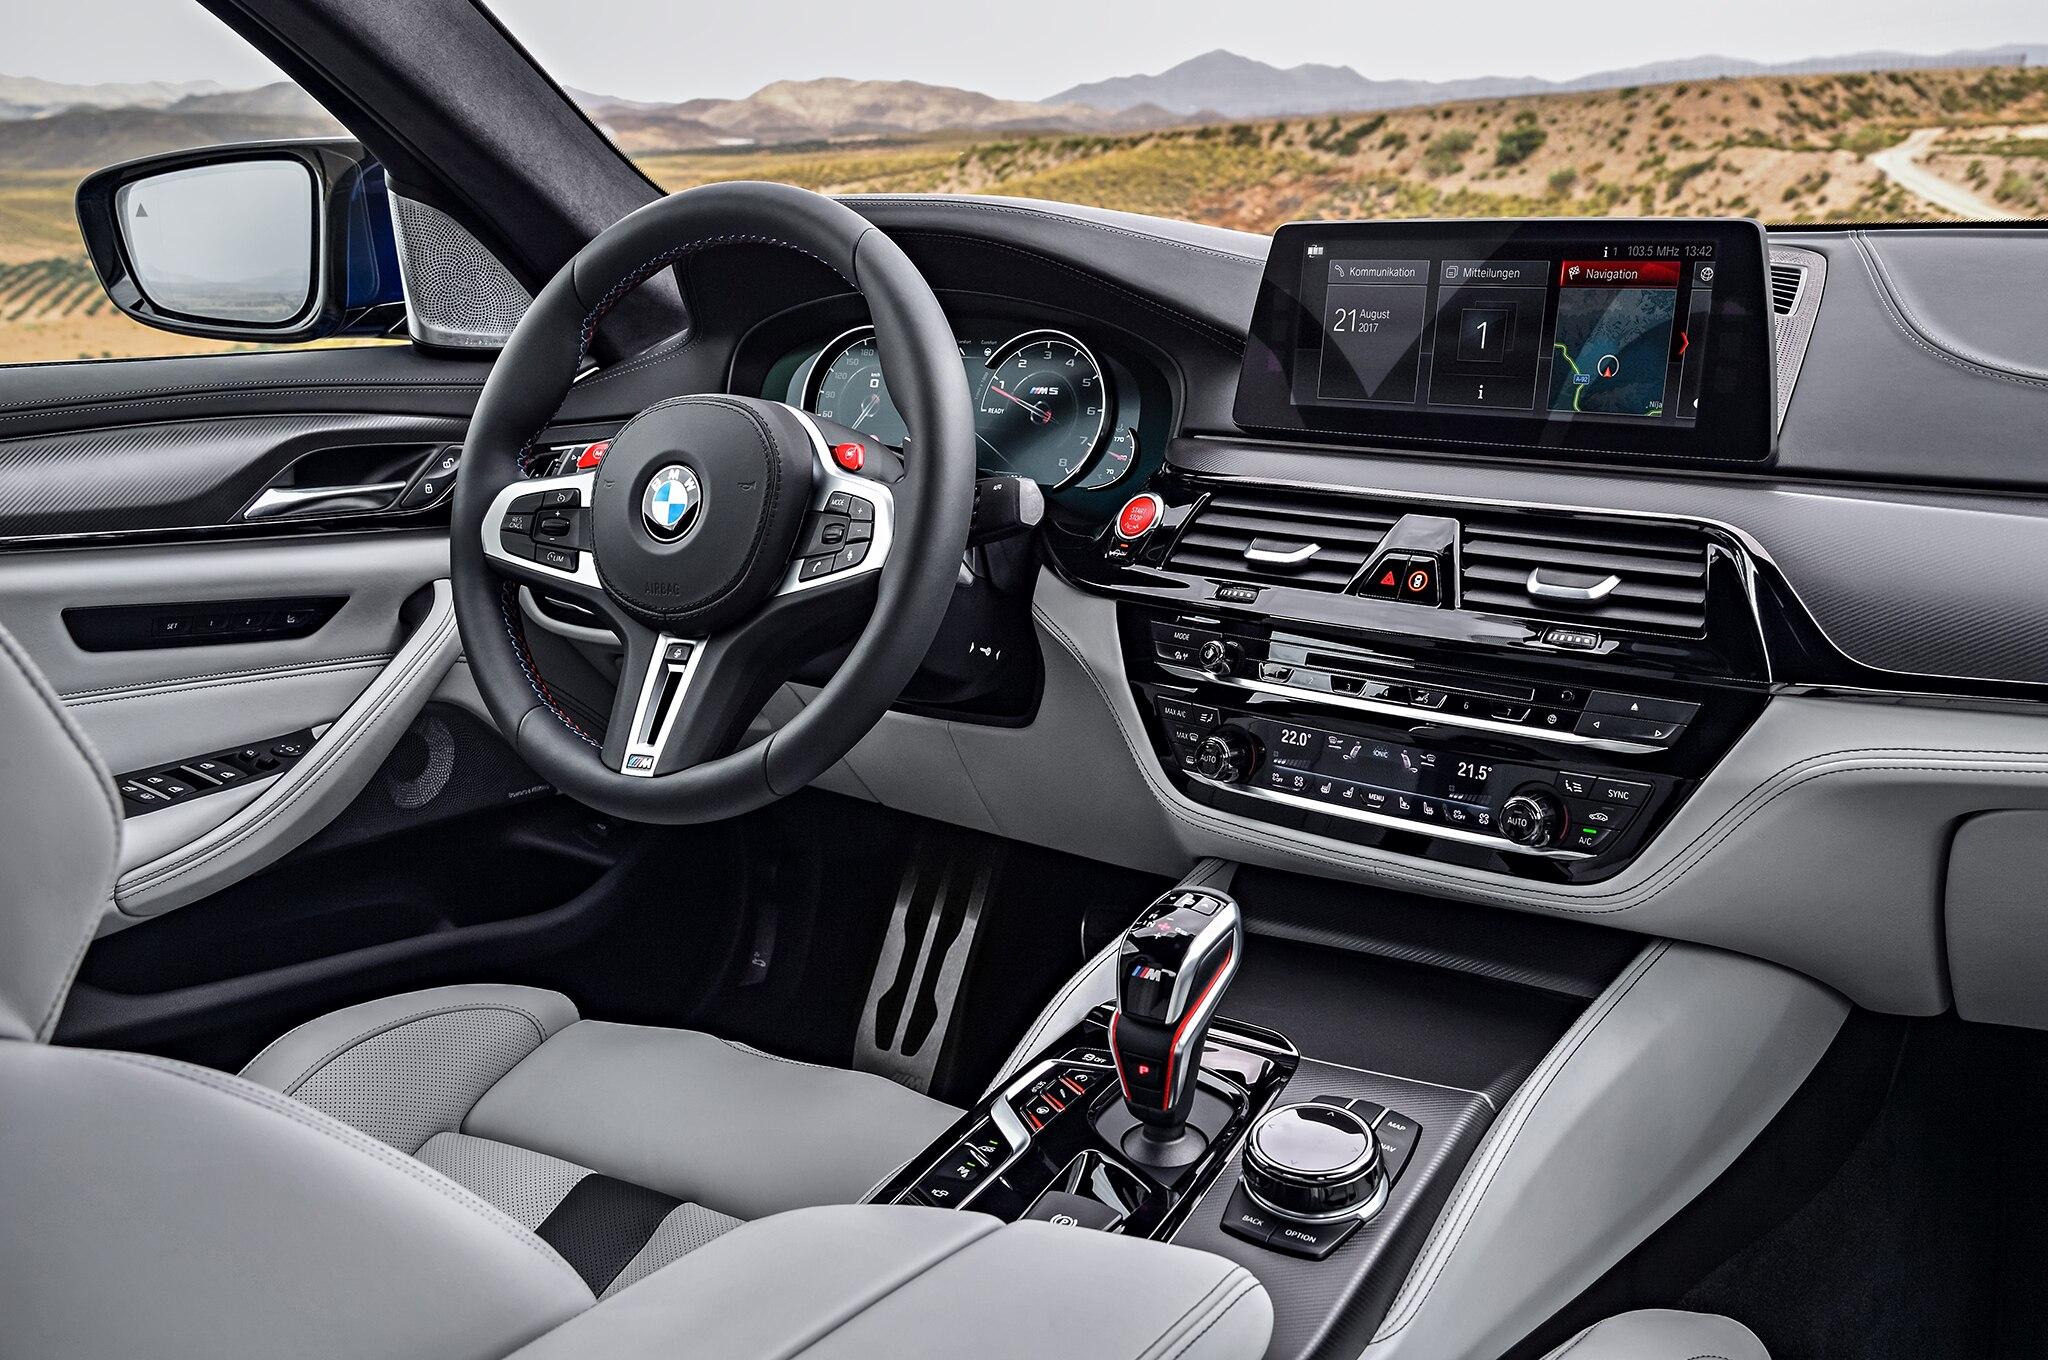 2018 BMW M5 Interior 01